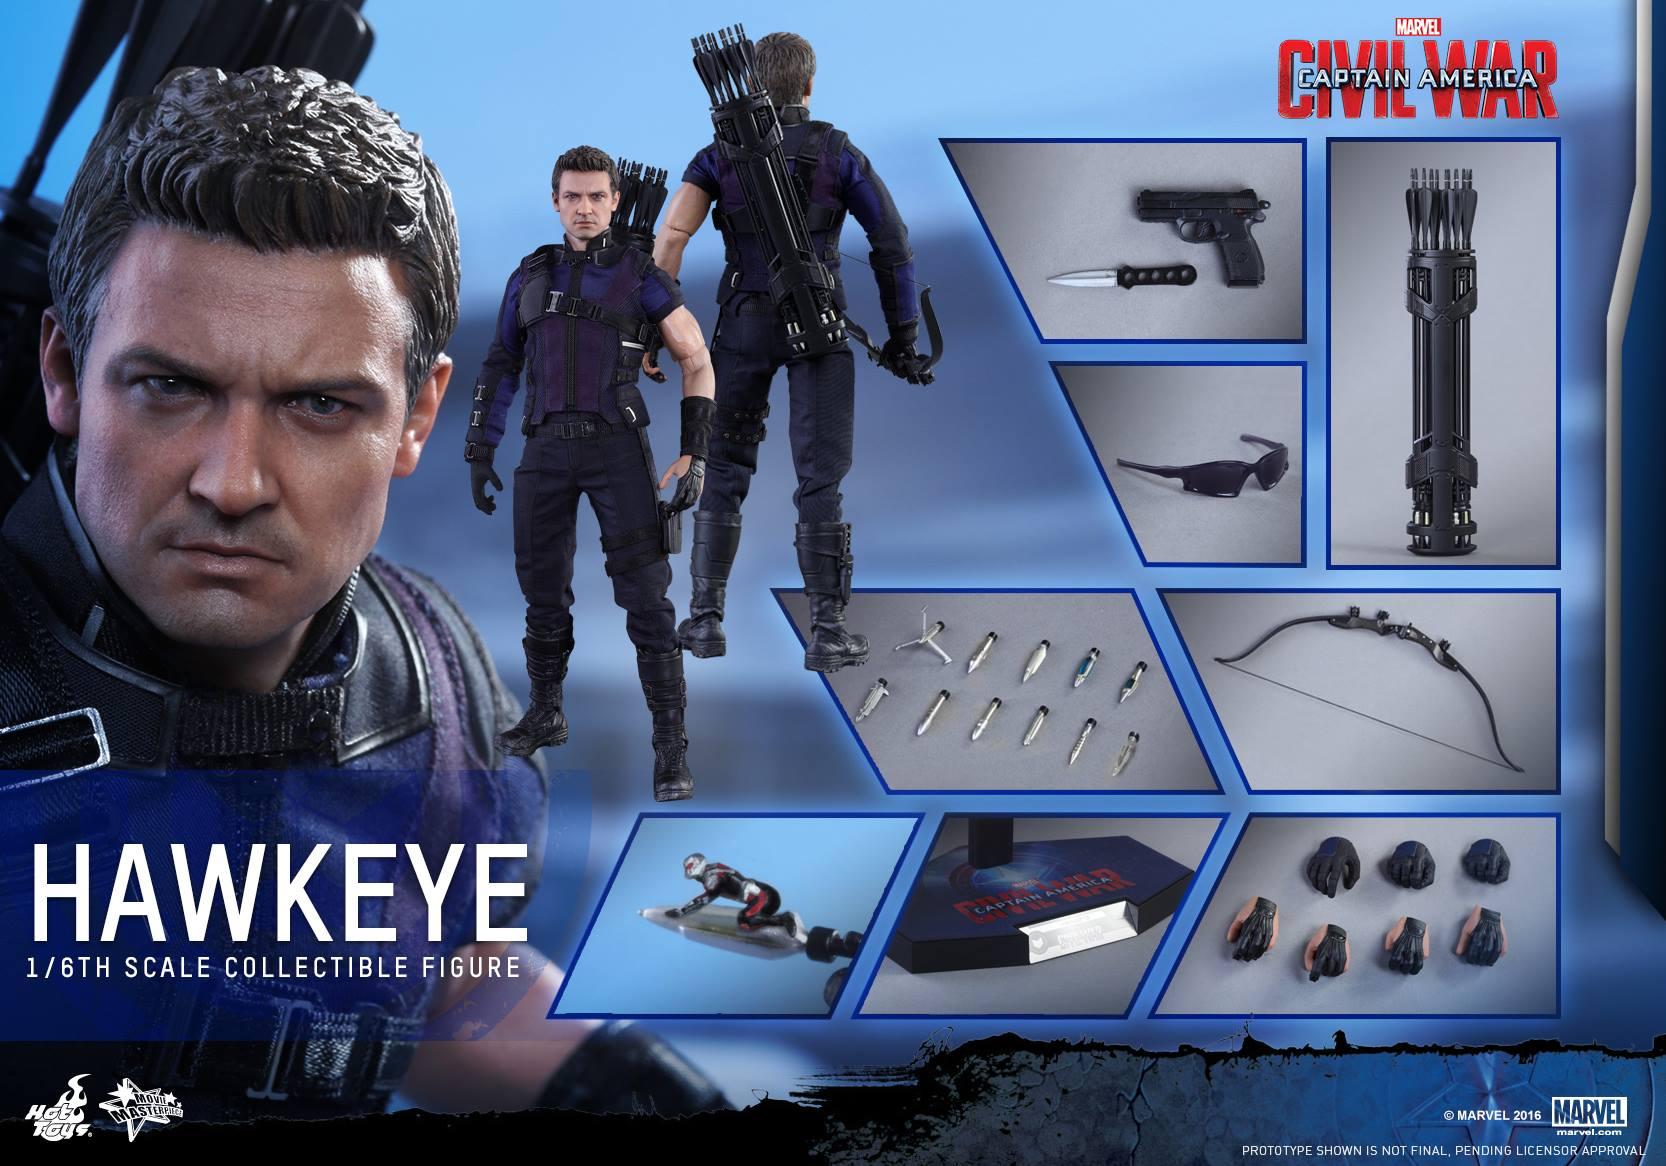 Hot Toys Captain America: Civil War Hawkeye Sixth Scale Figure Pre-Orders